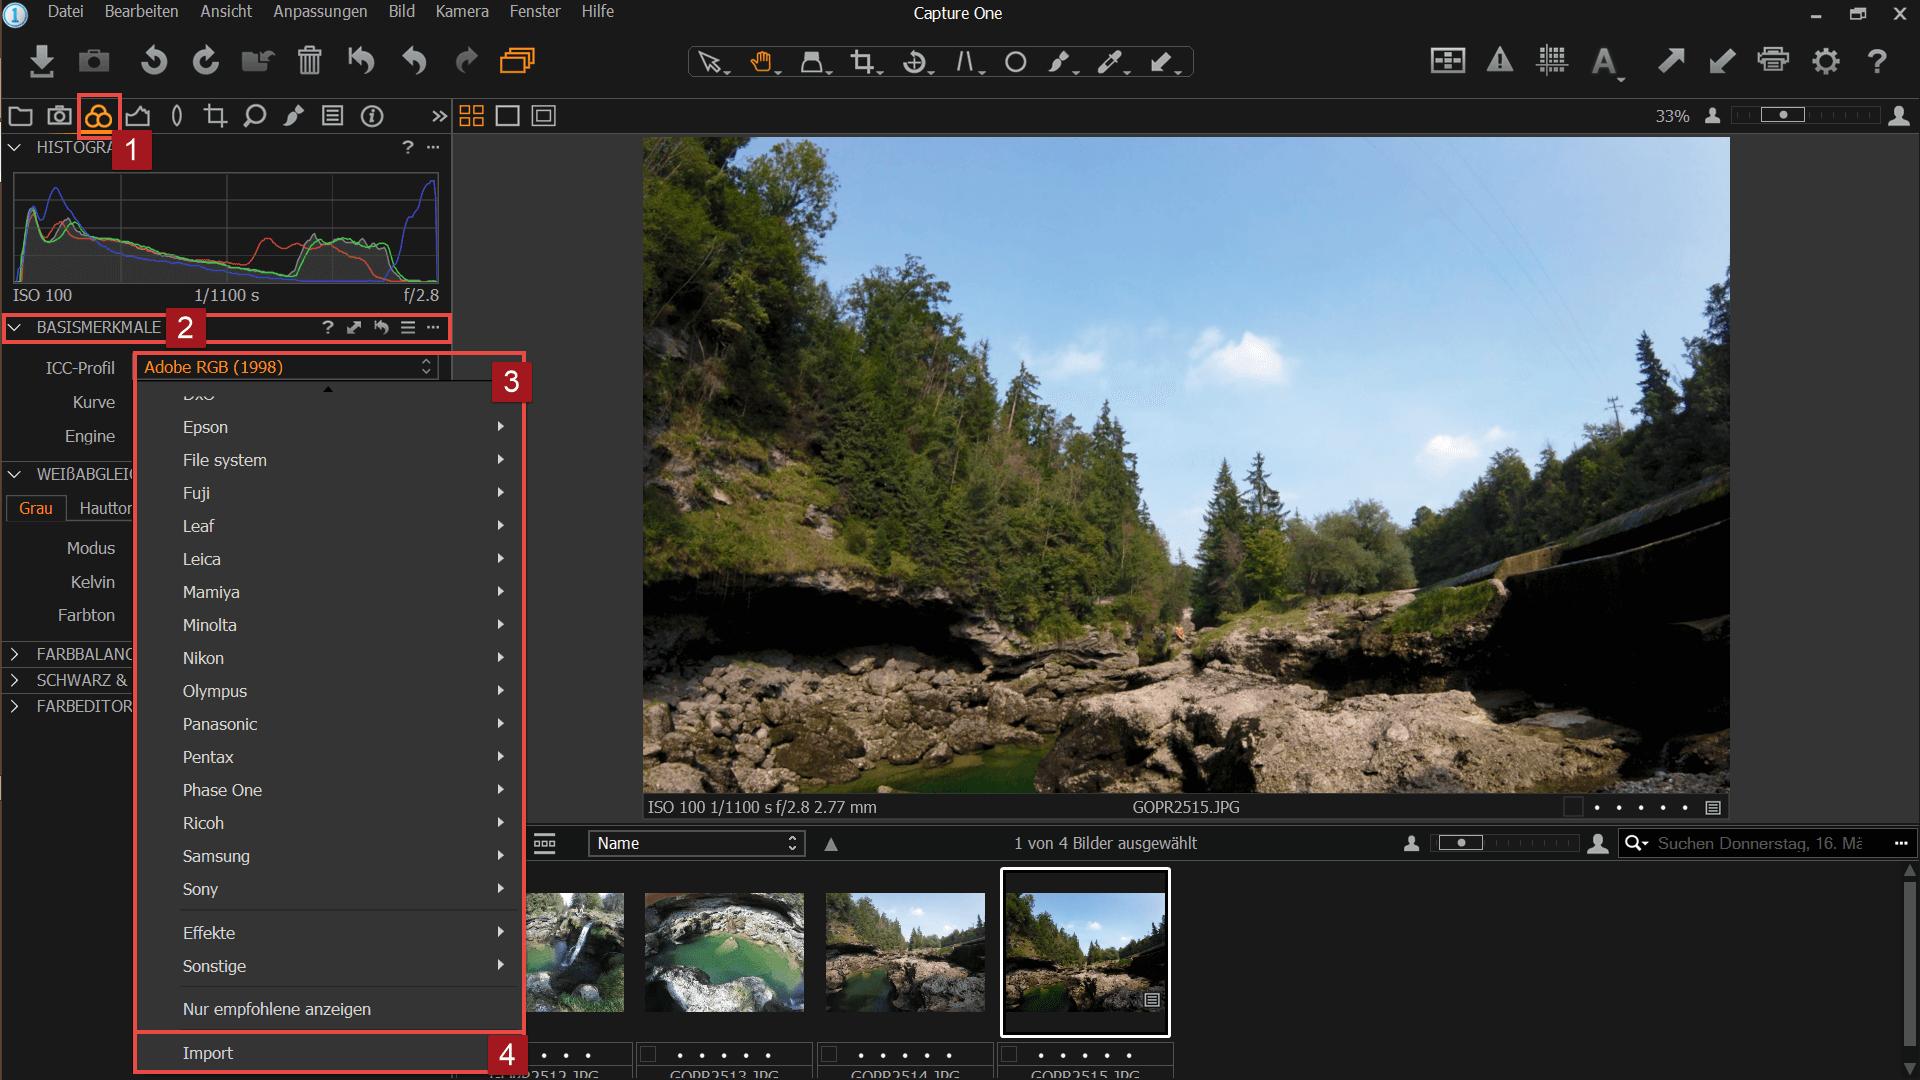 Nikon Capture One Pro - Hauptfenster Farben